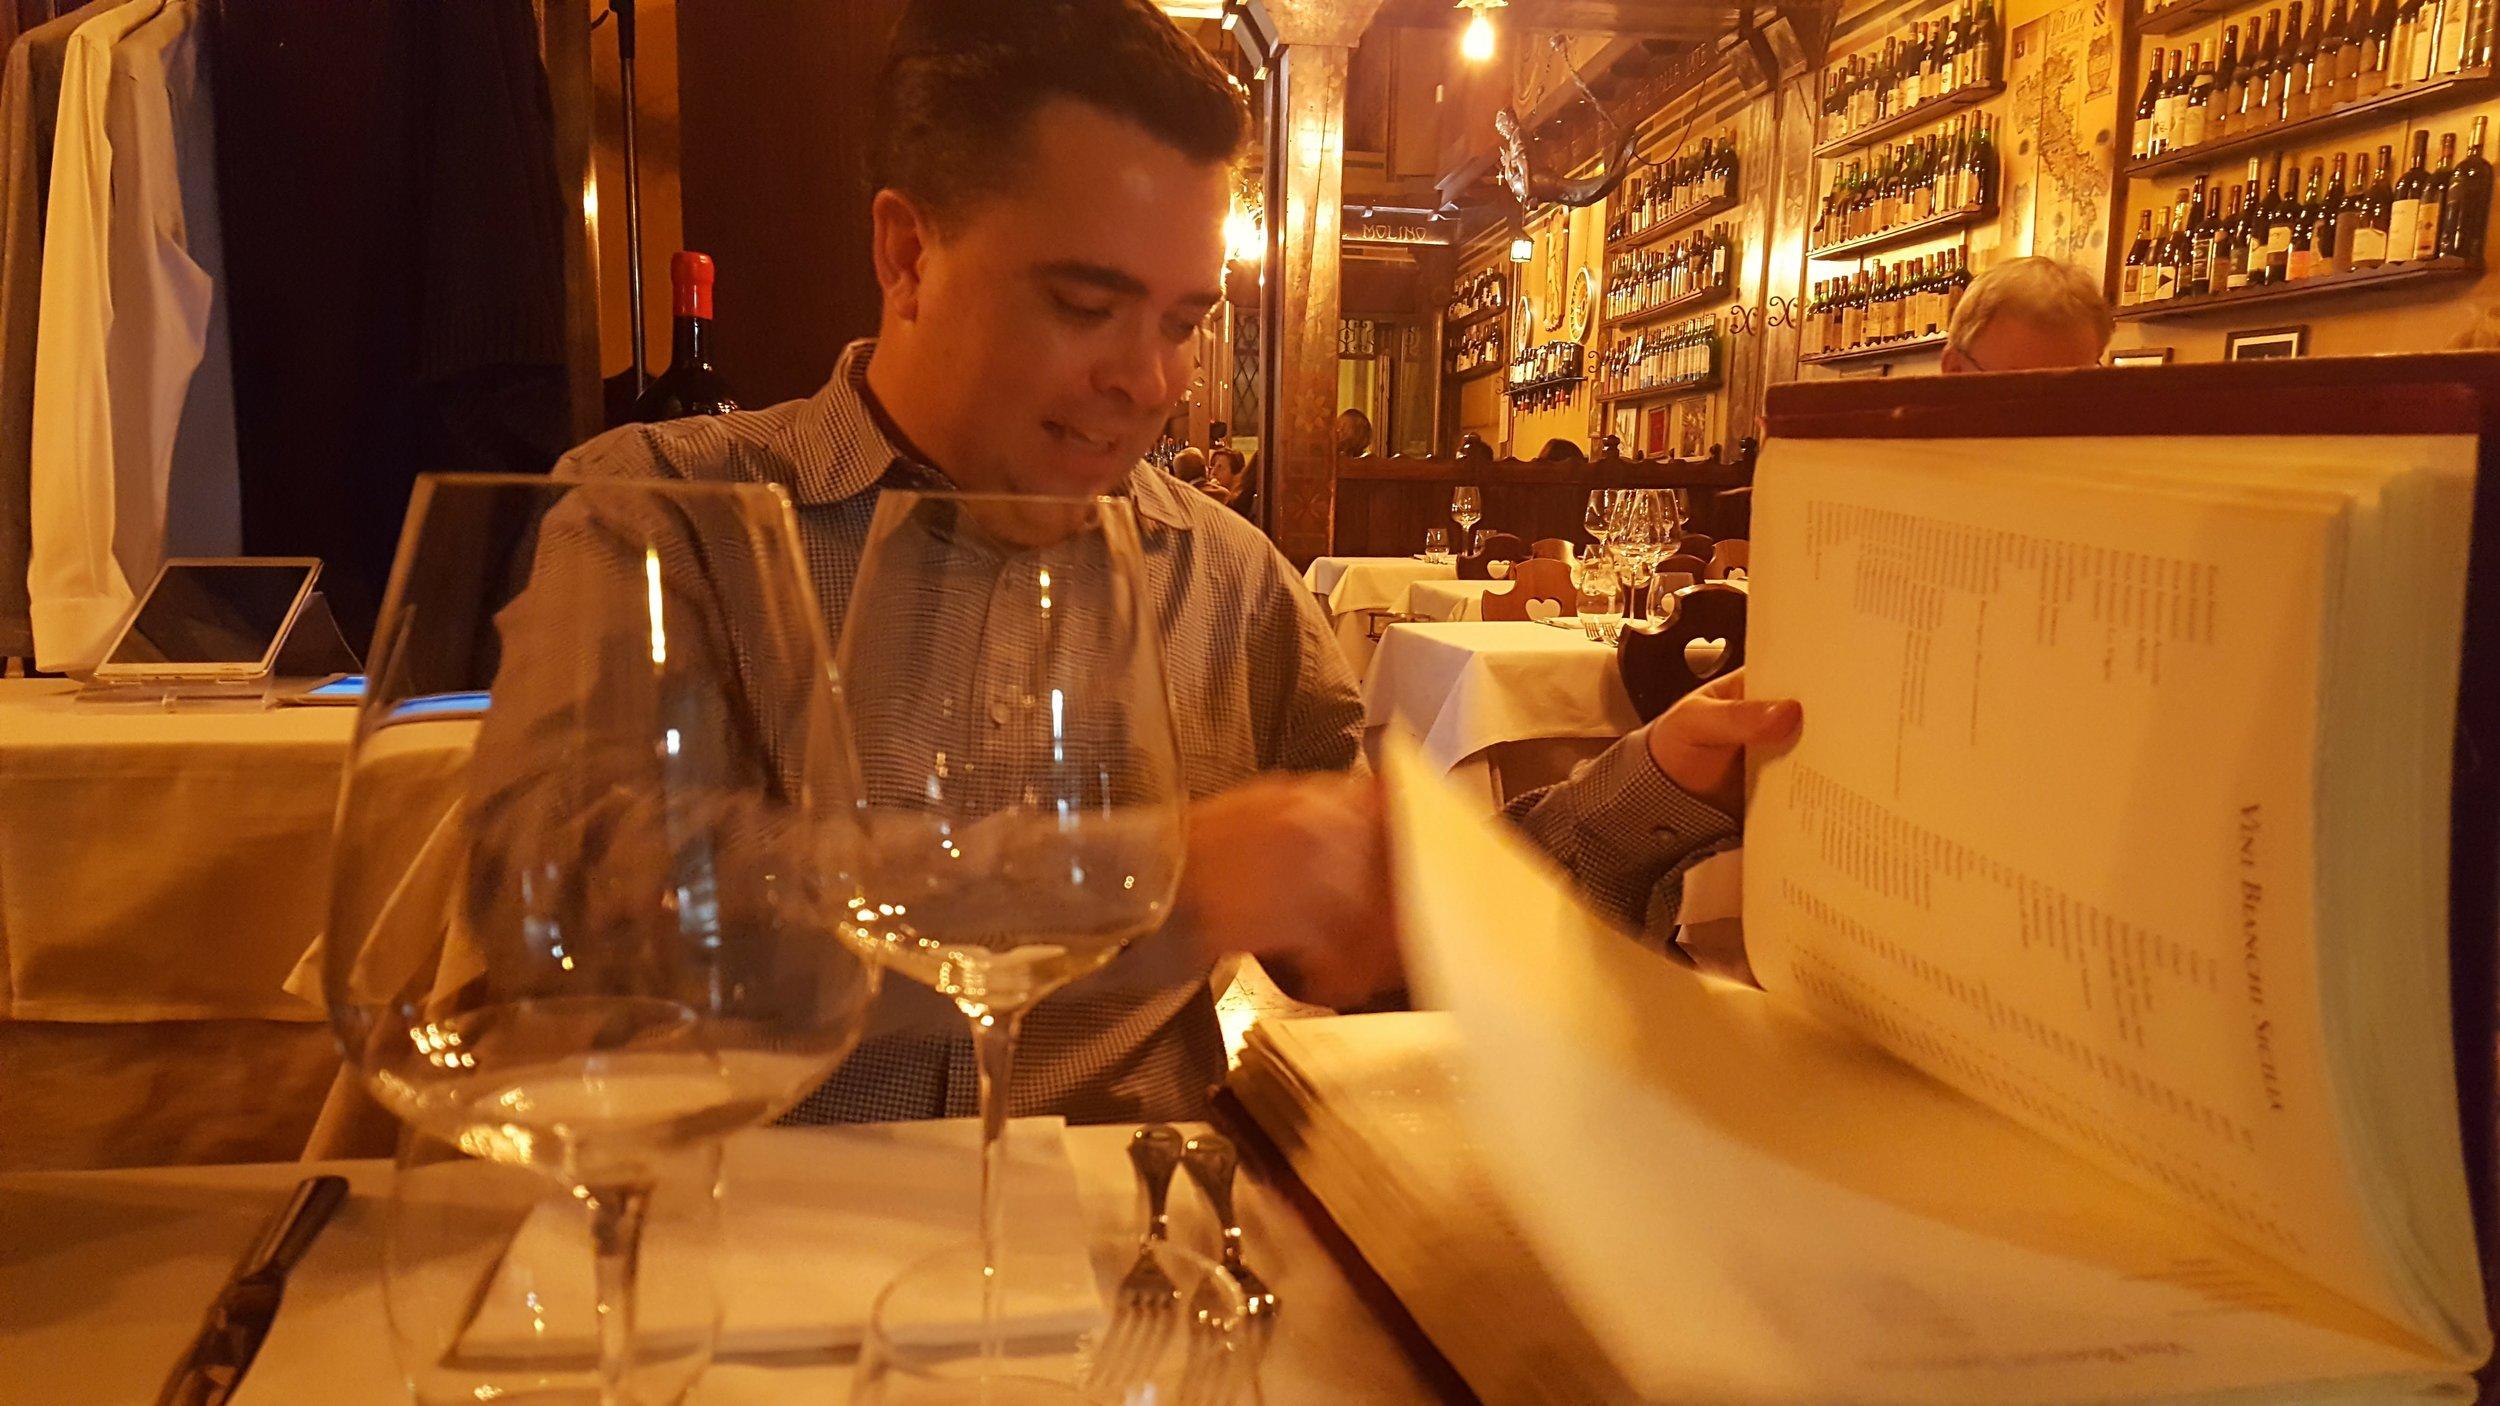 Excited at the wine list at Antica Bodega del Vino, Verona